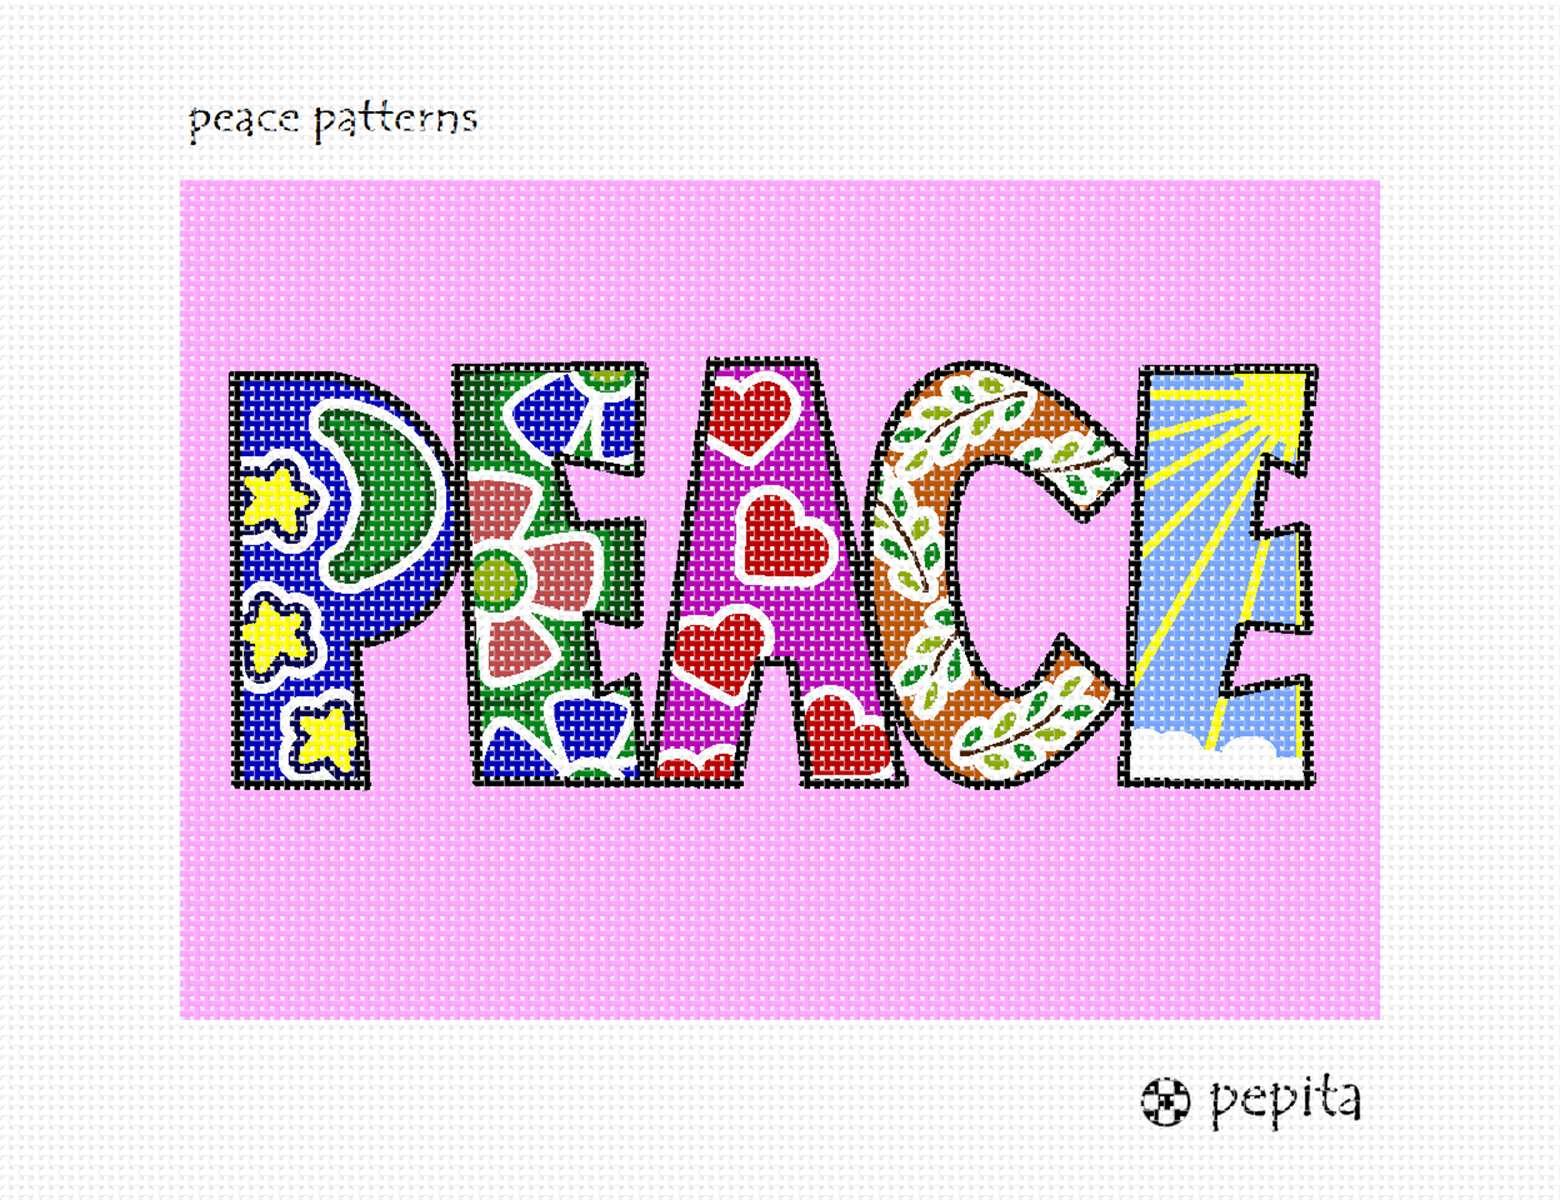 needlepoint canvas   peace patterns